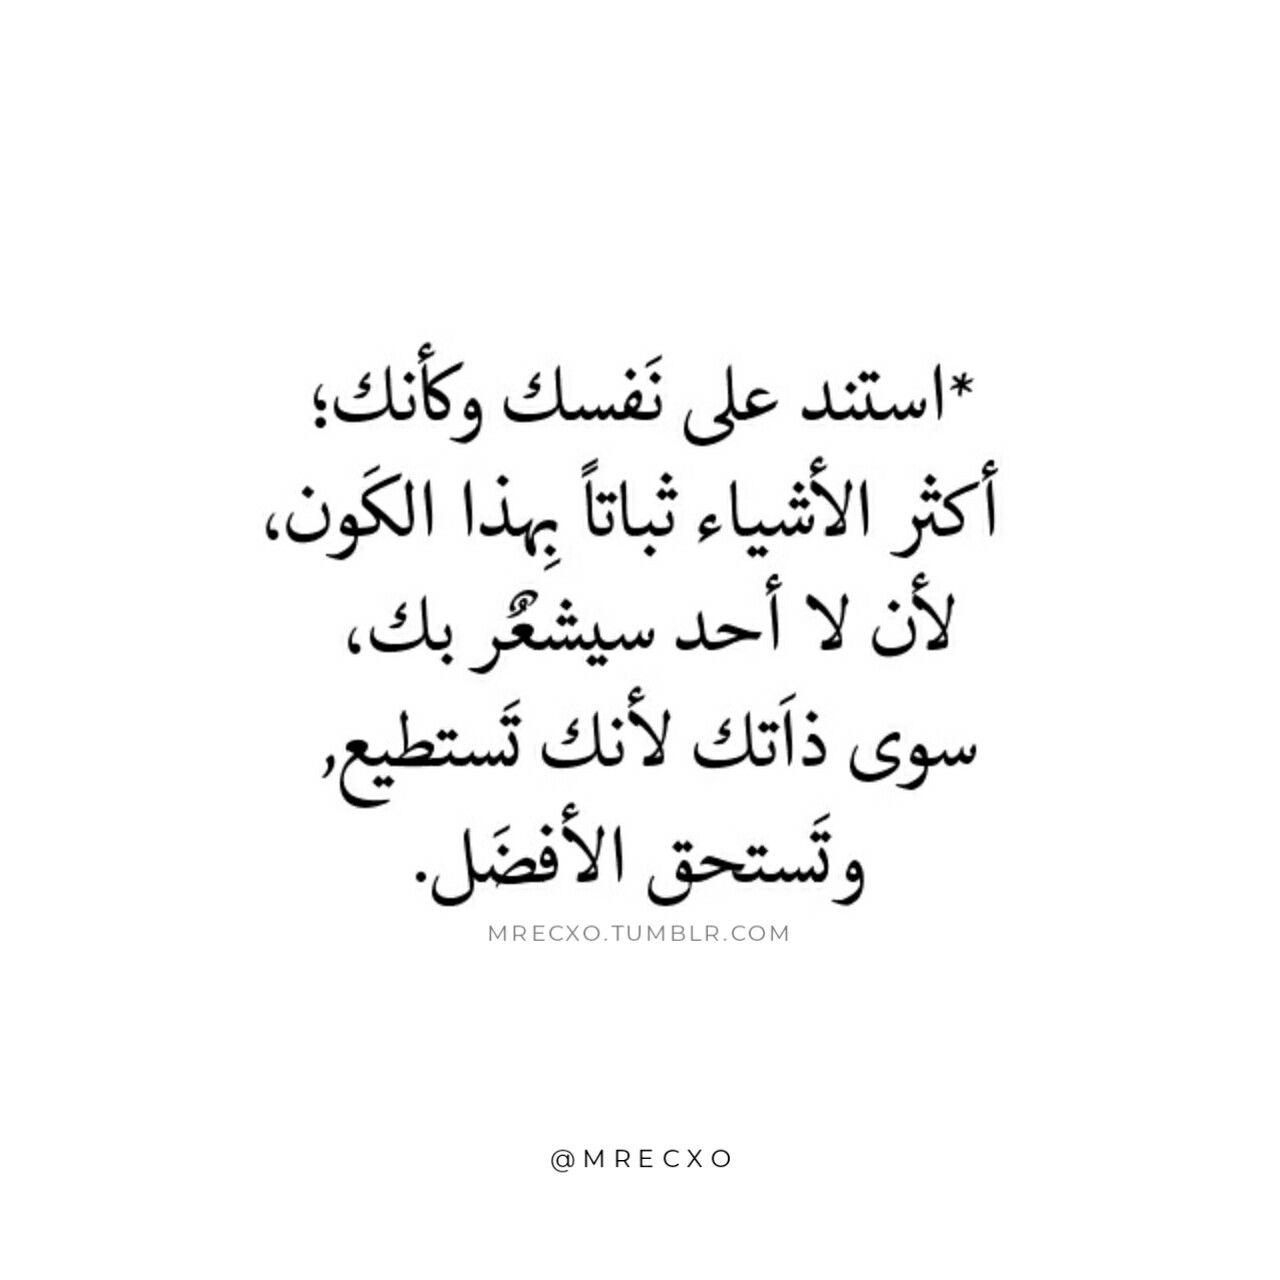 Pin By Rahma On اقتباسات Quotations Inspirational Quotes Love Words